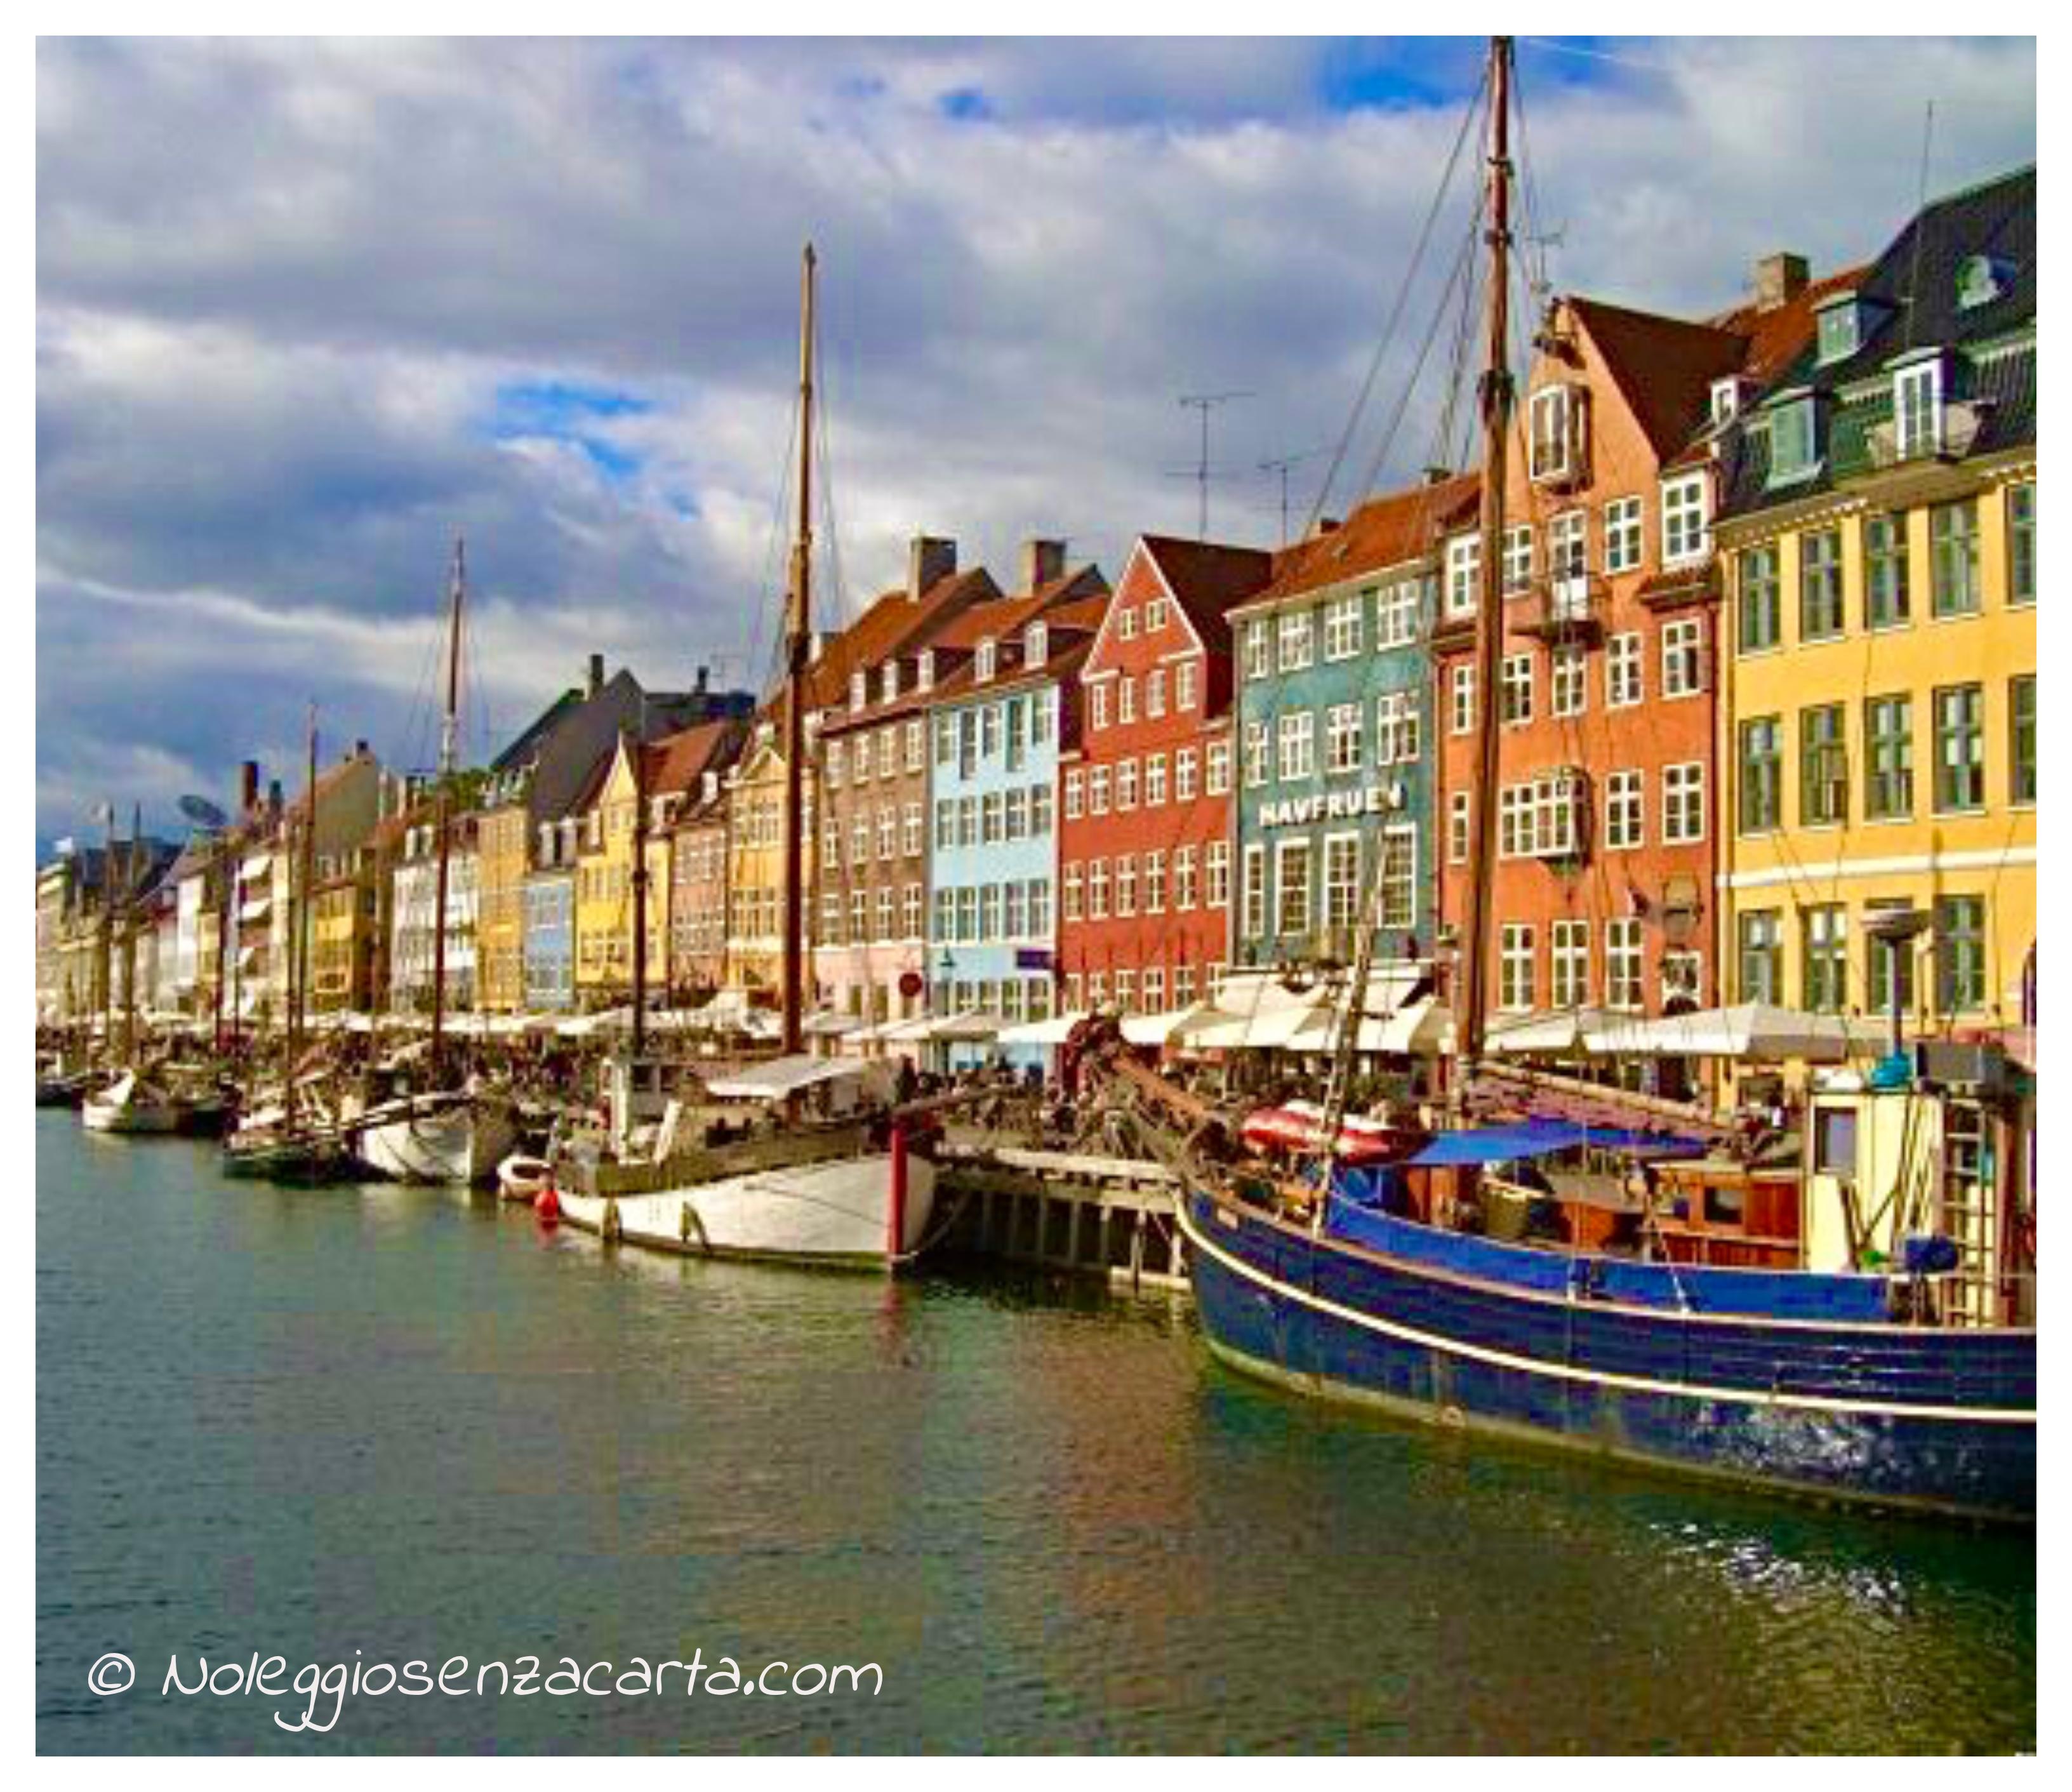 Alquiler coche sin tarjeta de crédito en Copenhague – Dinamarca